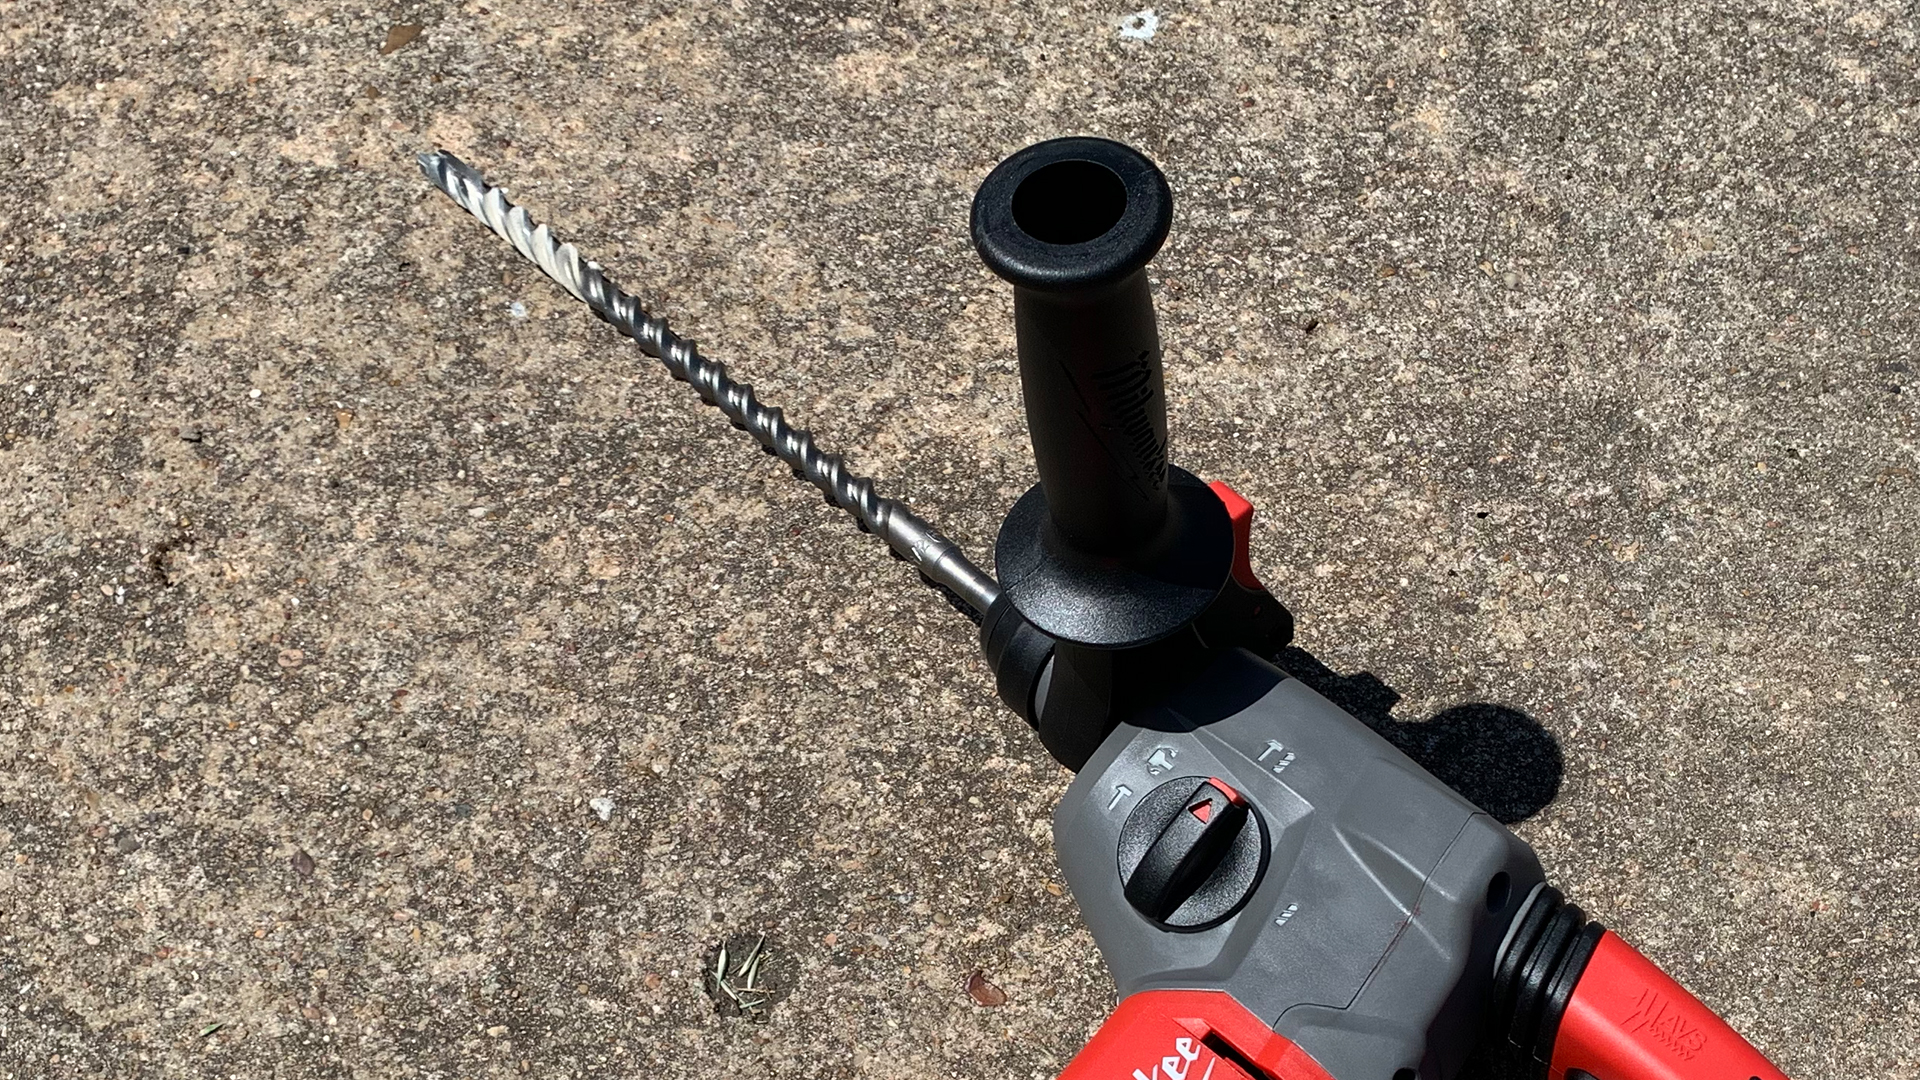 bosch-bulldog-carbide-rotary-hammer-bit.jpg